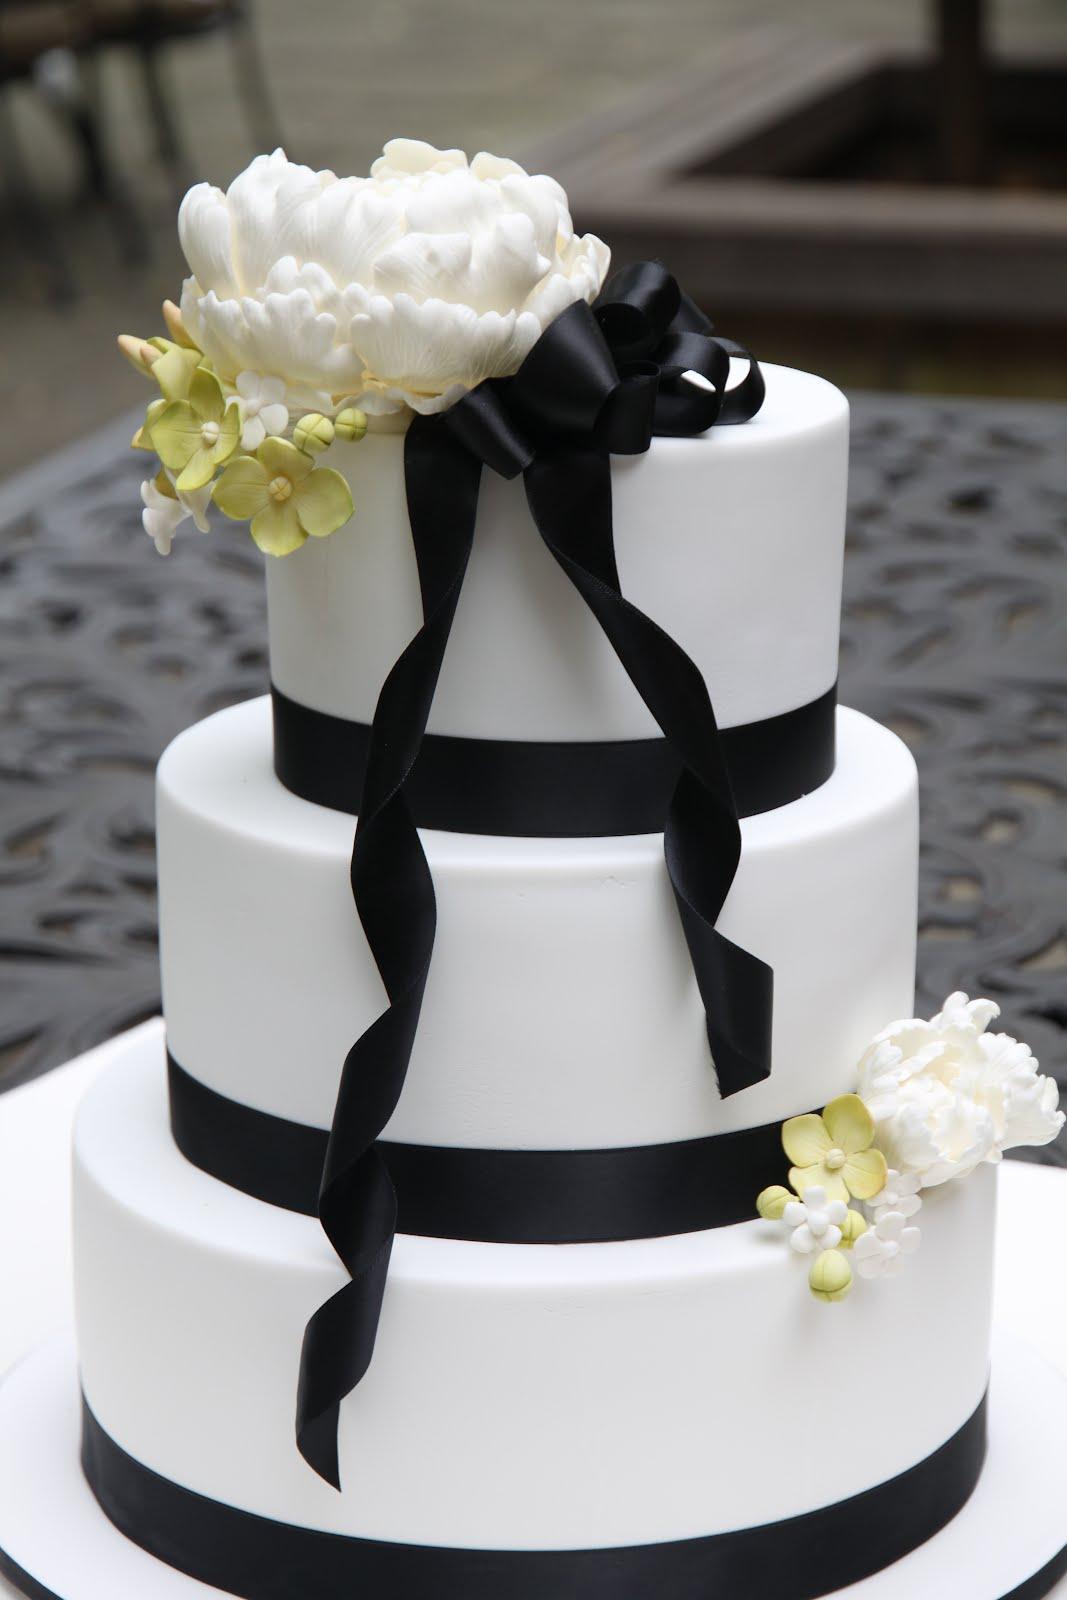 Sugar Creation Sam and Daves wedding cake Black and White Chic